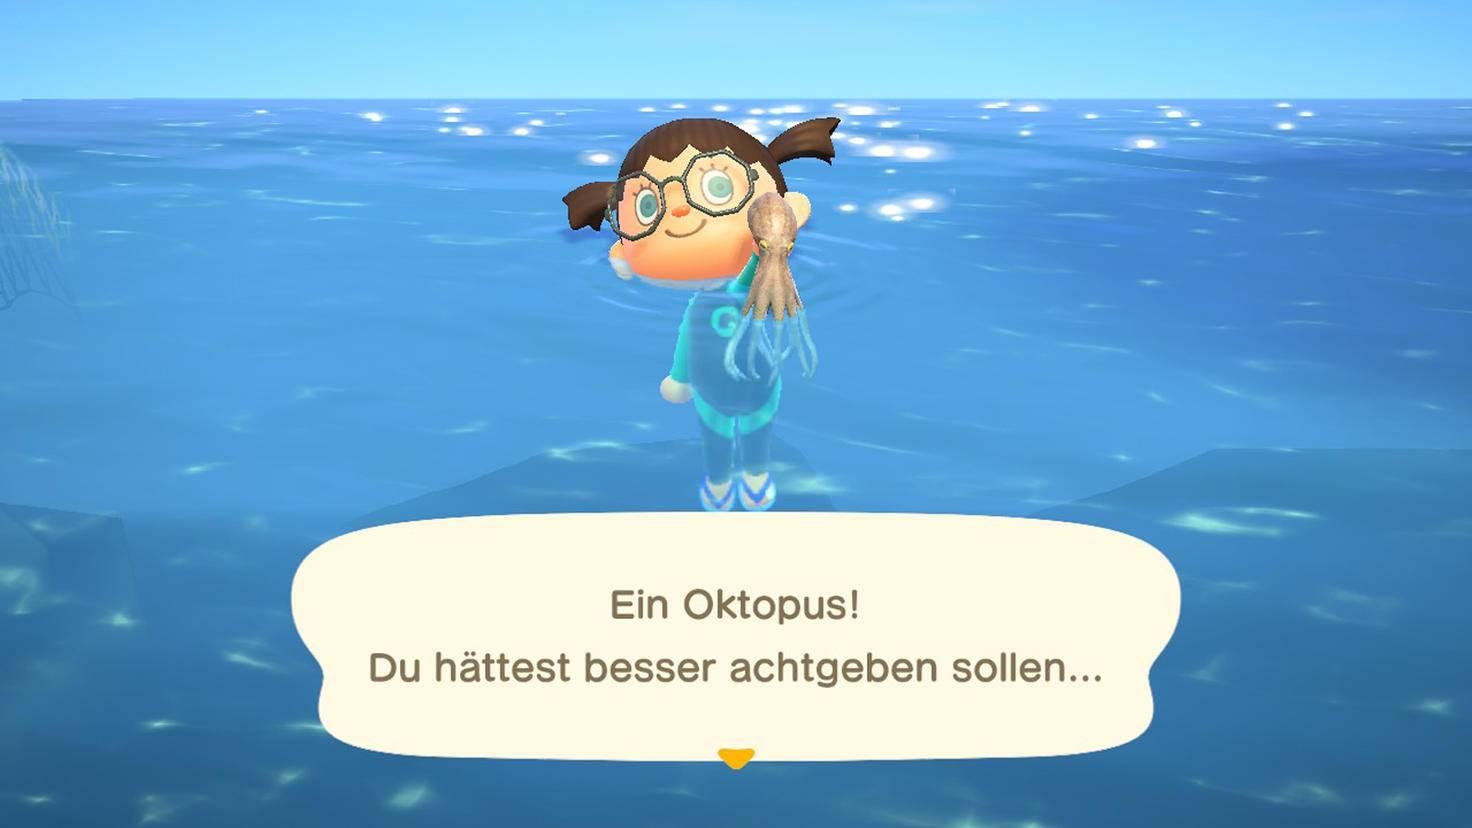 Animal Crossing New Horizons Oktopus